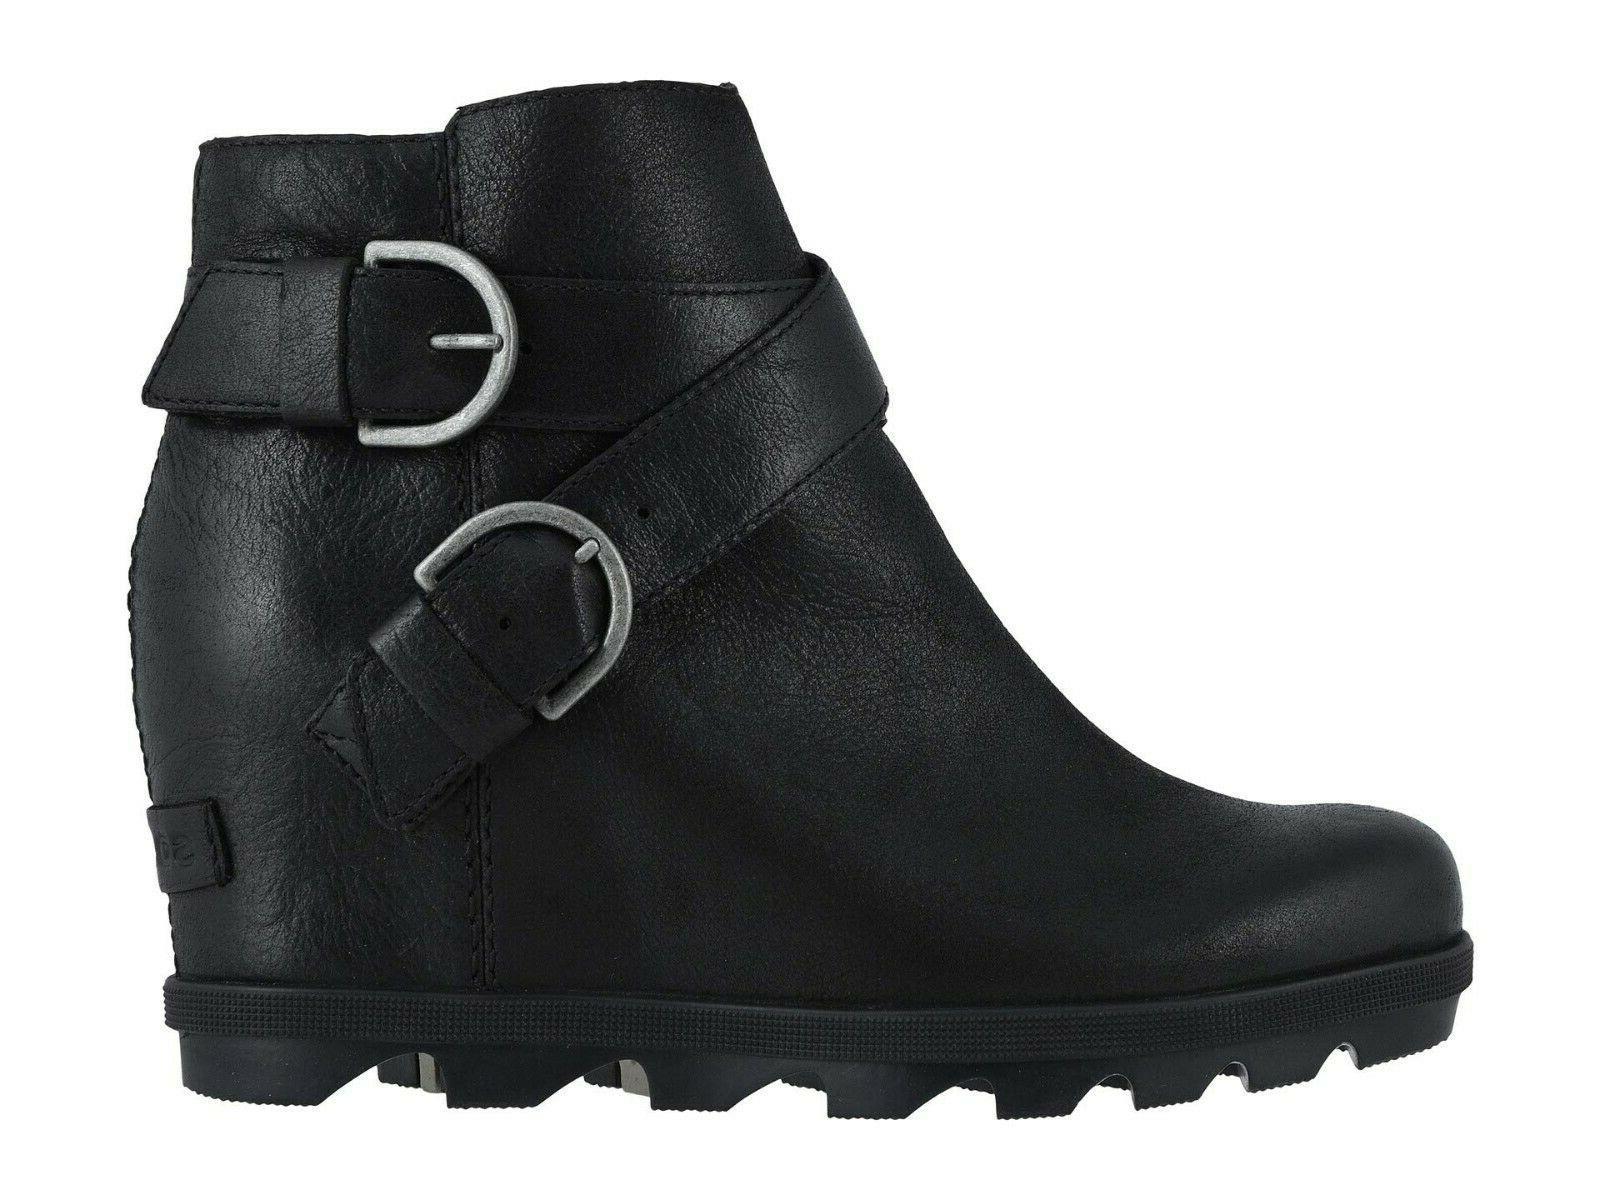 Sorel Women's Joan Arctic Wedge Leather Black 8 US